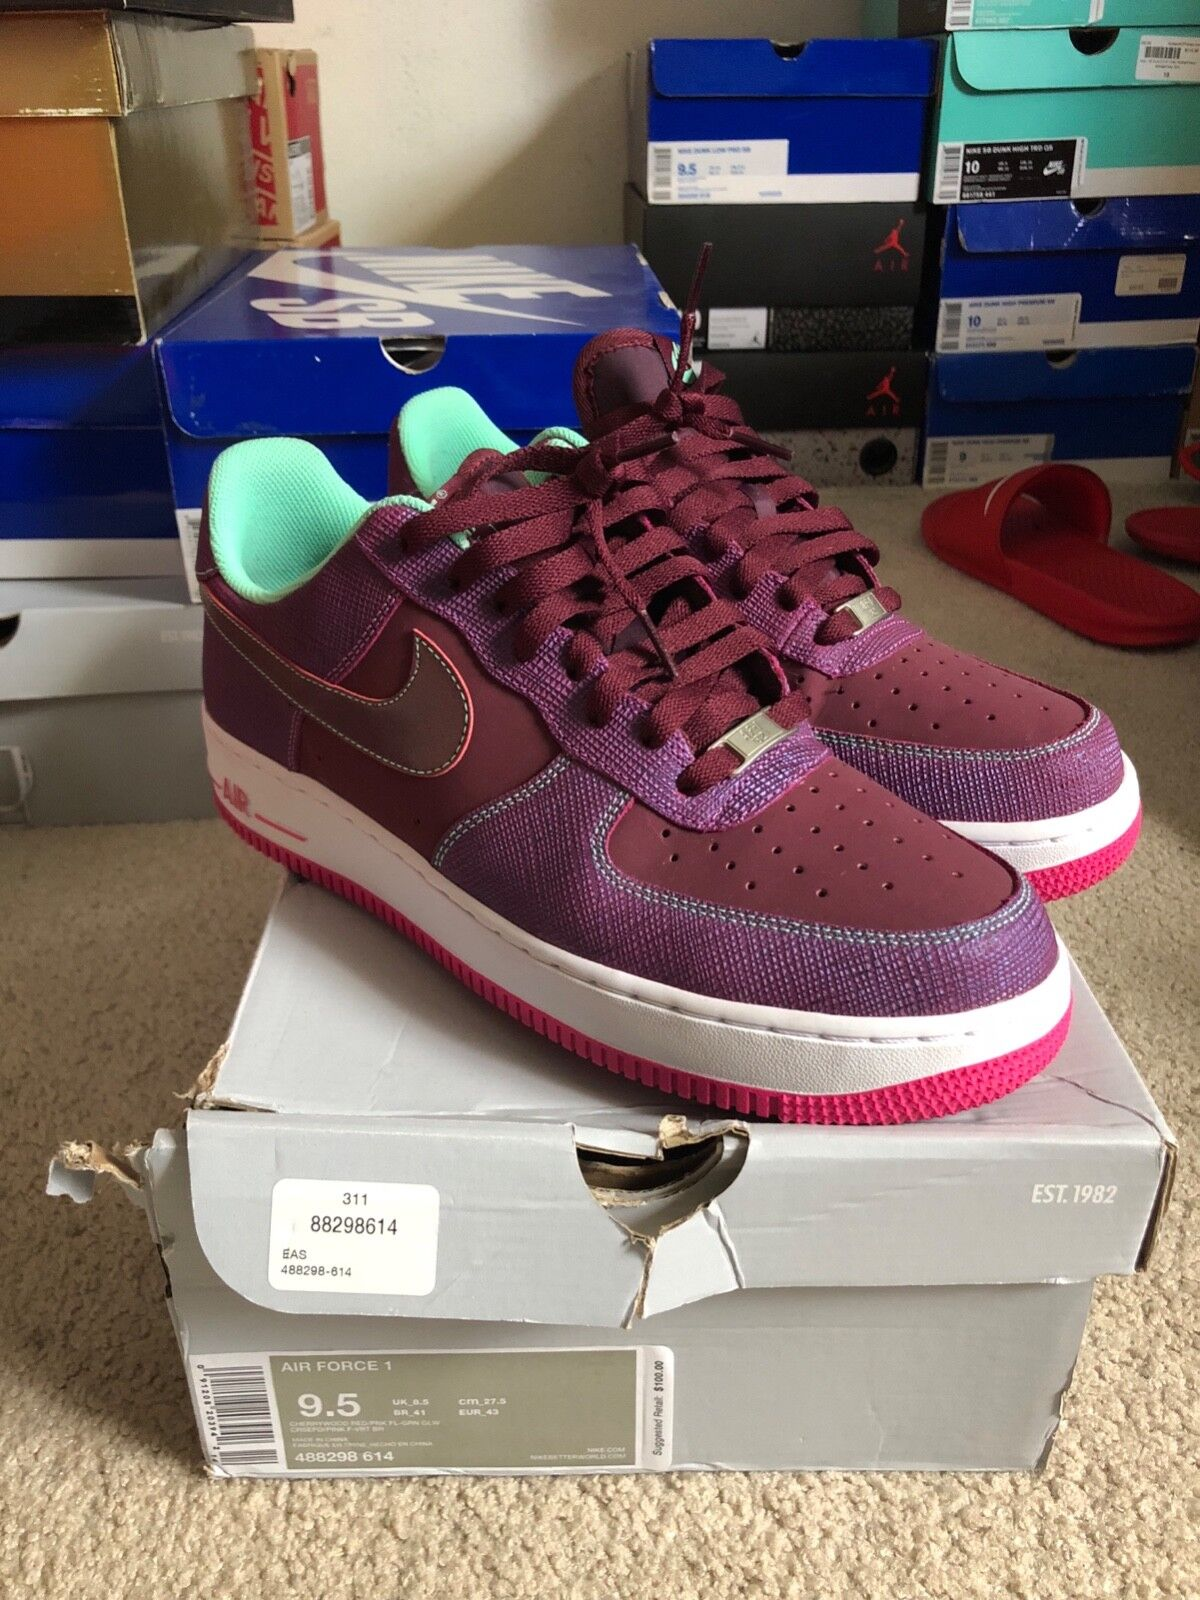 Nike Air Force 1 1 1 Low Cherrywood Red Pink 488298 614 2ae95c